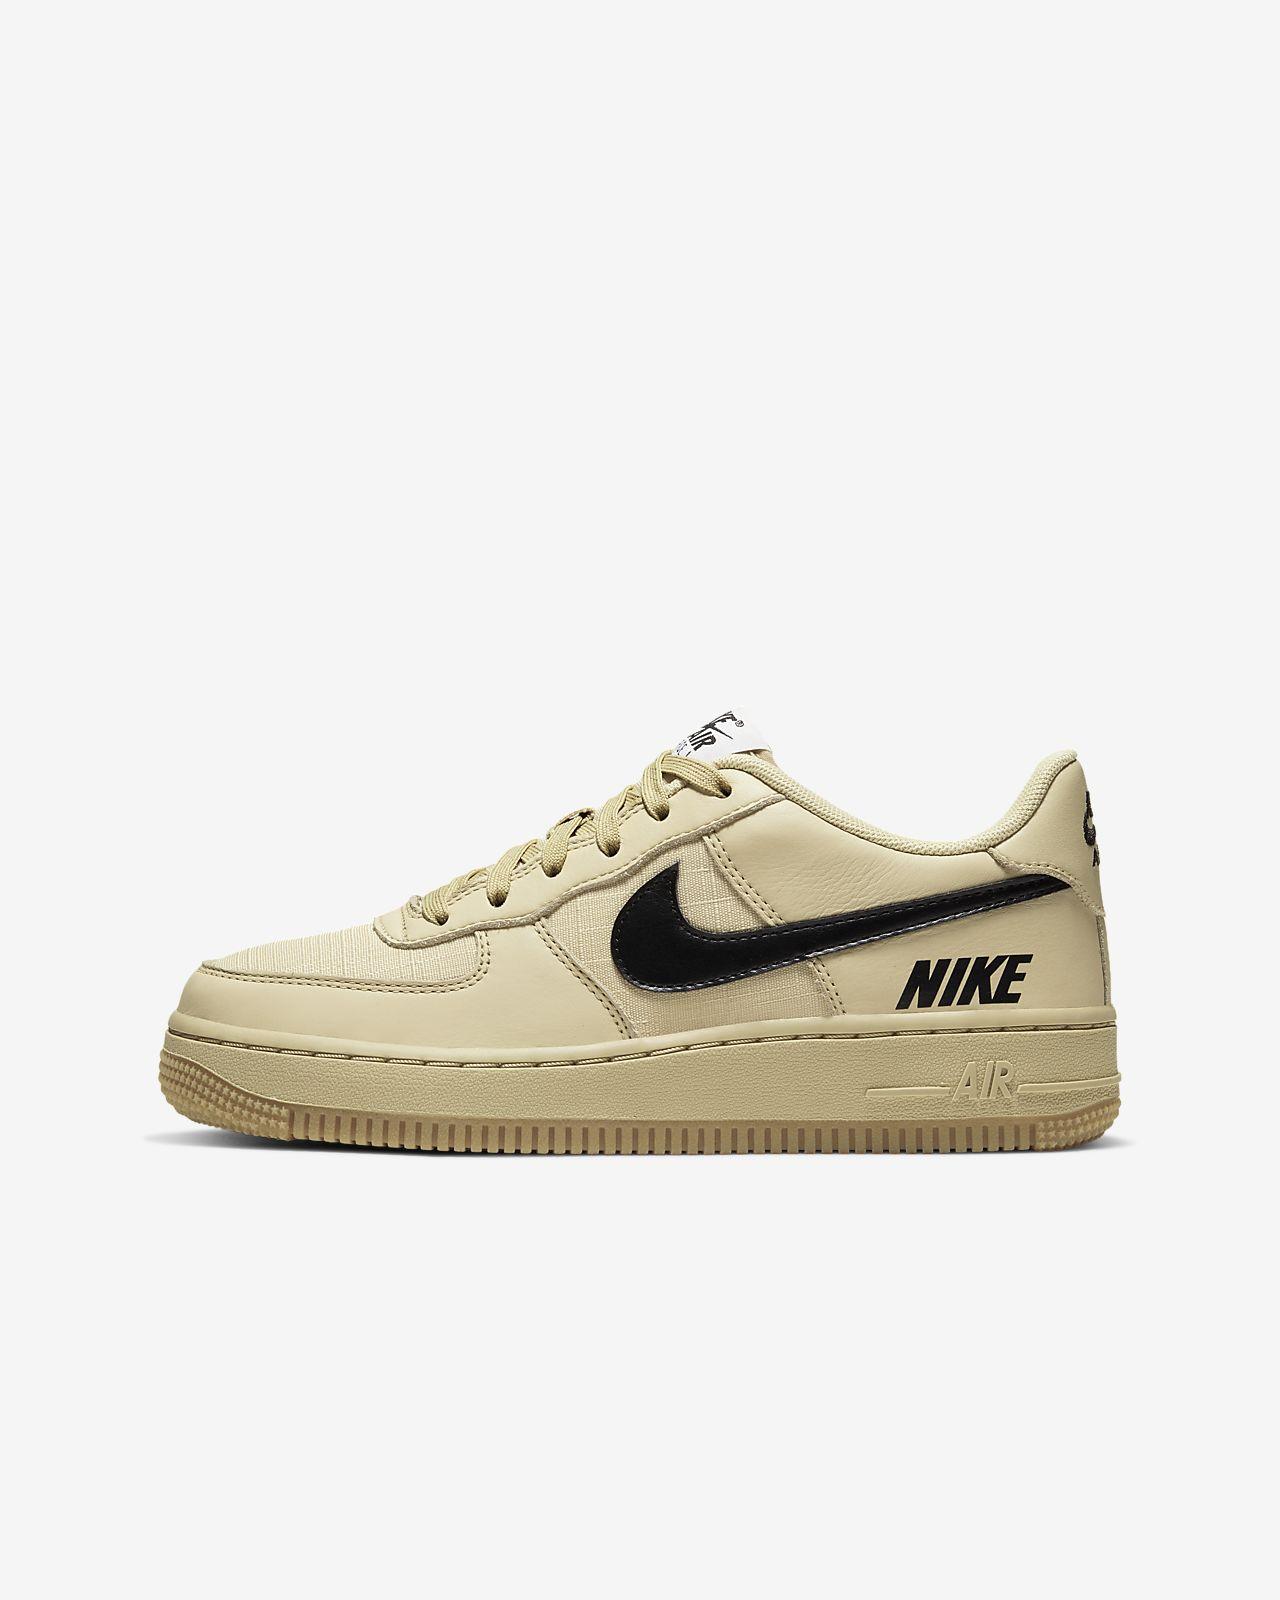 Nike Air Force 1 LV8 5-sko til store børn